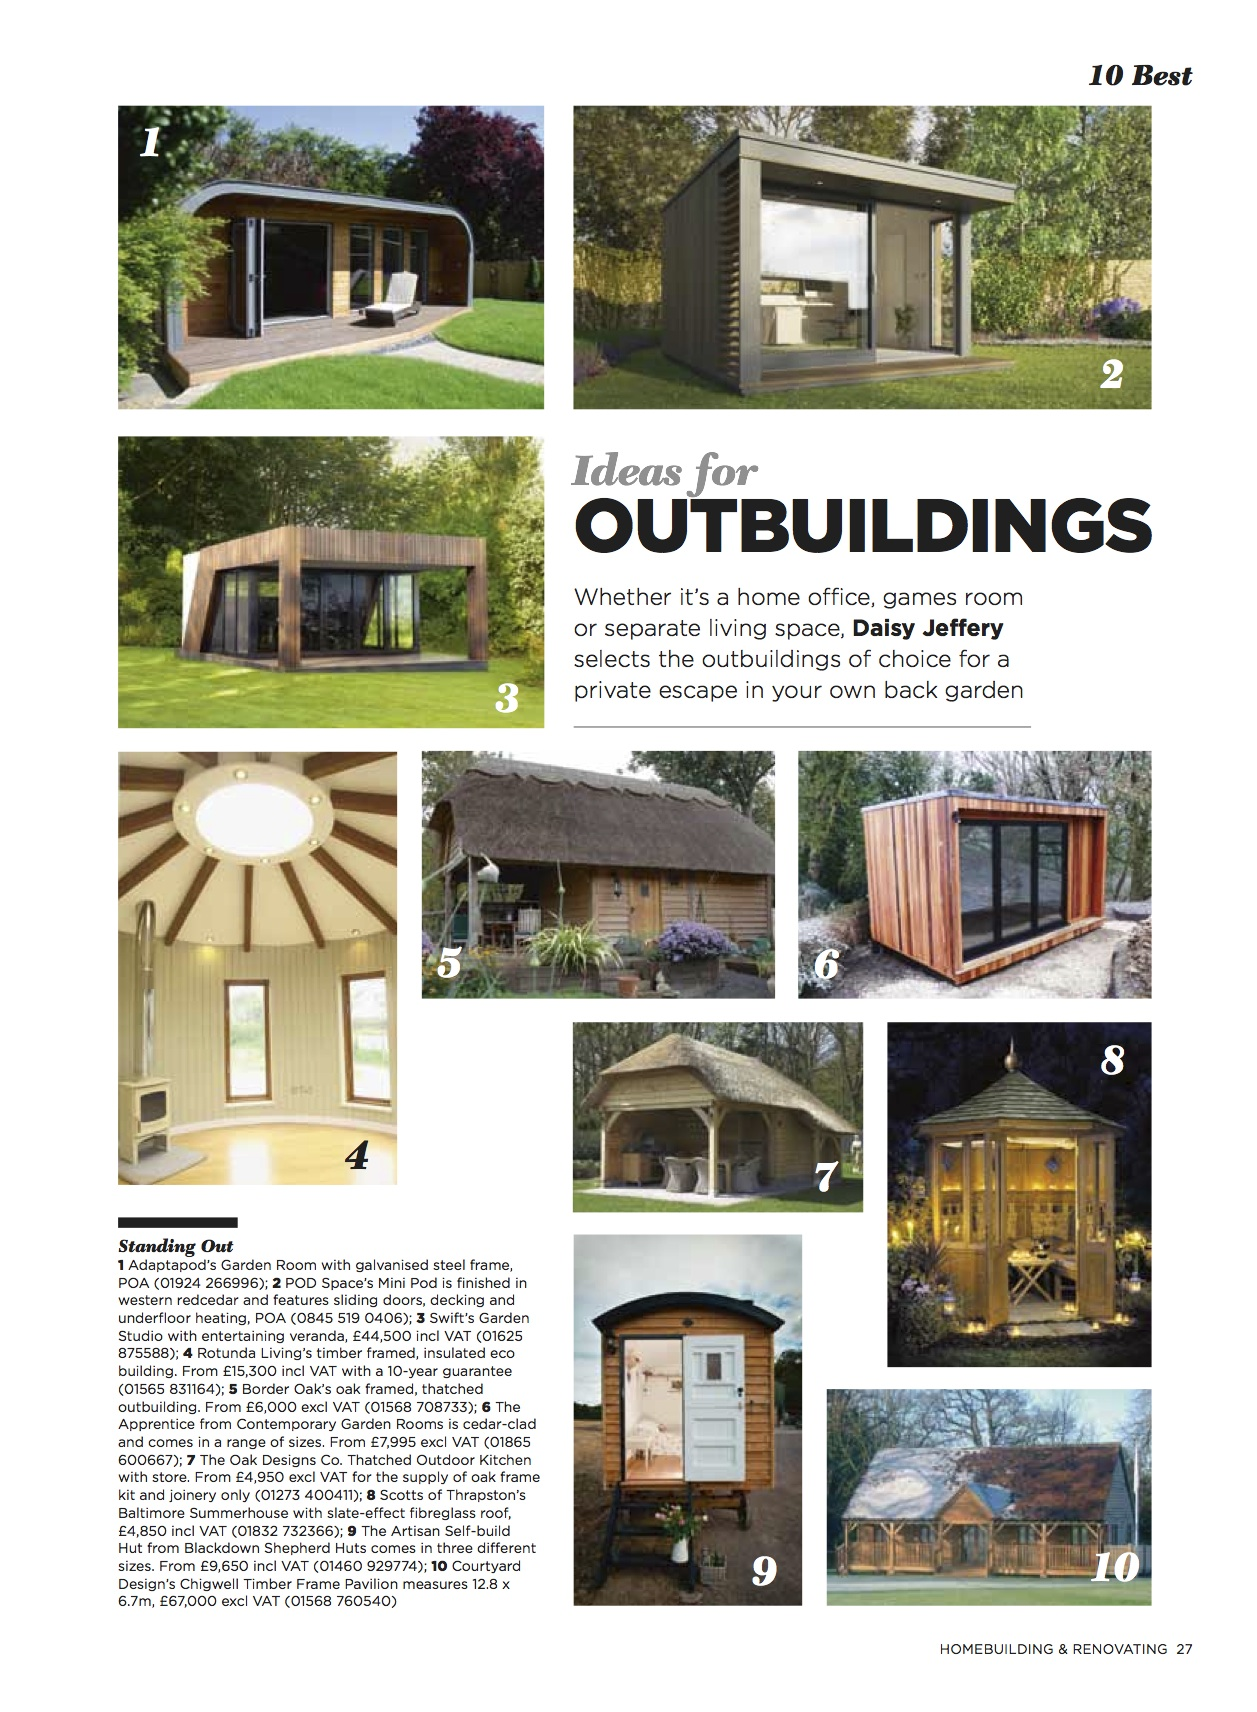 10 Best Outbuildings (1).jpg